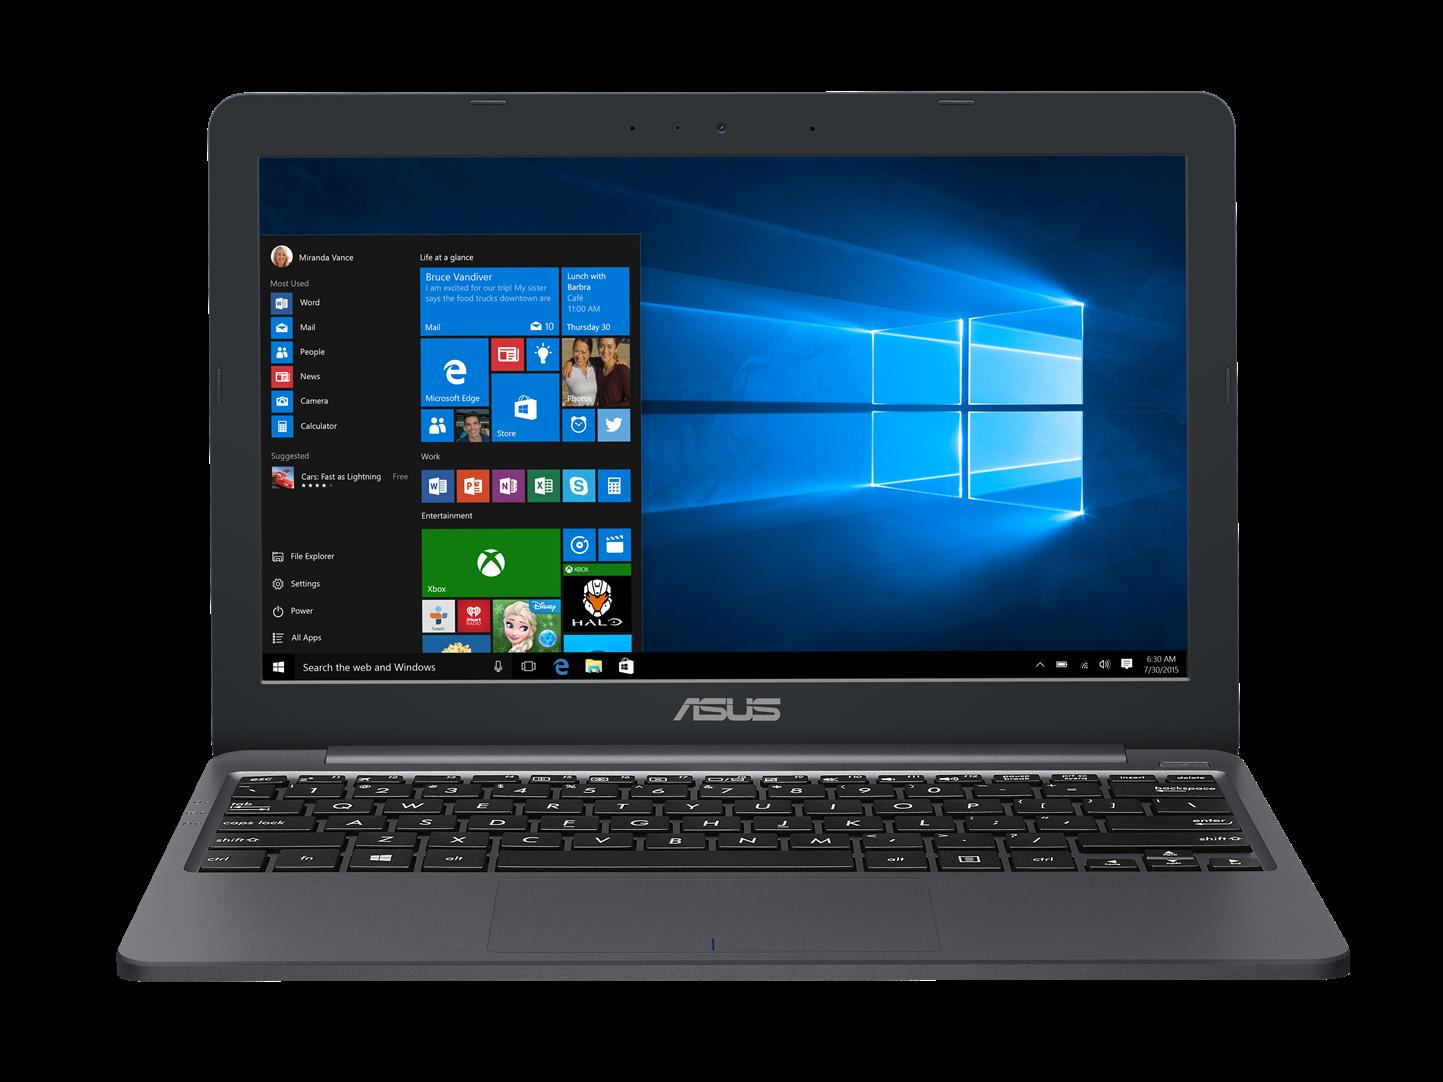 "ASUS E203NA-FD107TS Celeron N3350/4GB/32GB EMMC/Intel HD Graphics 500/11,6"" 1366x768 HD/Lesklý/BT/W10 Home/Grey"